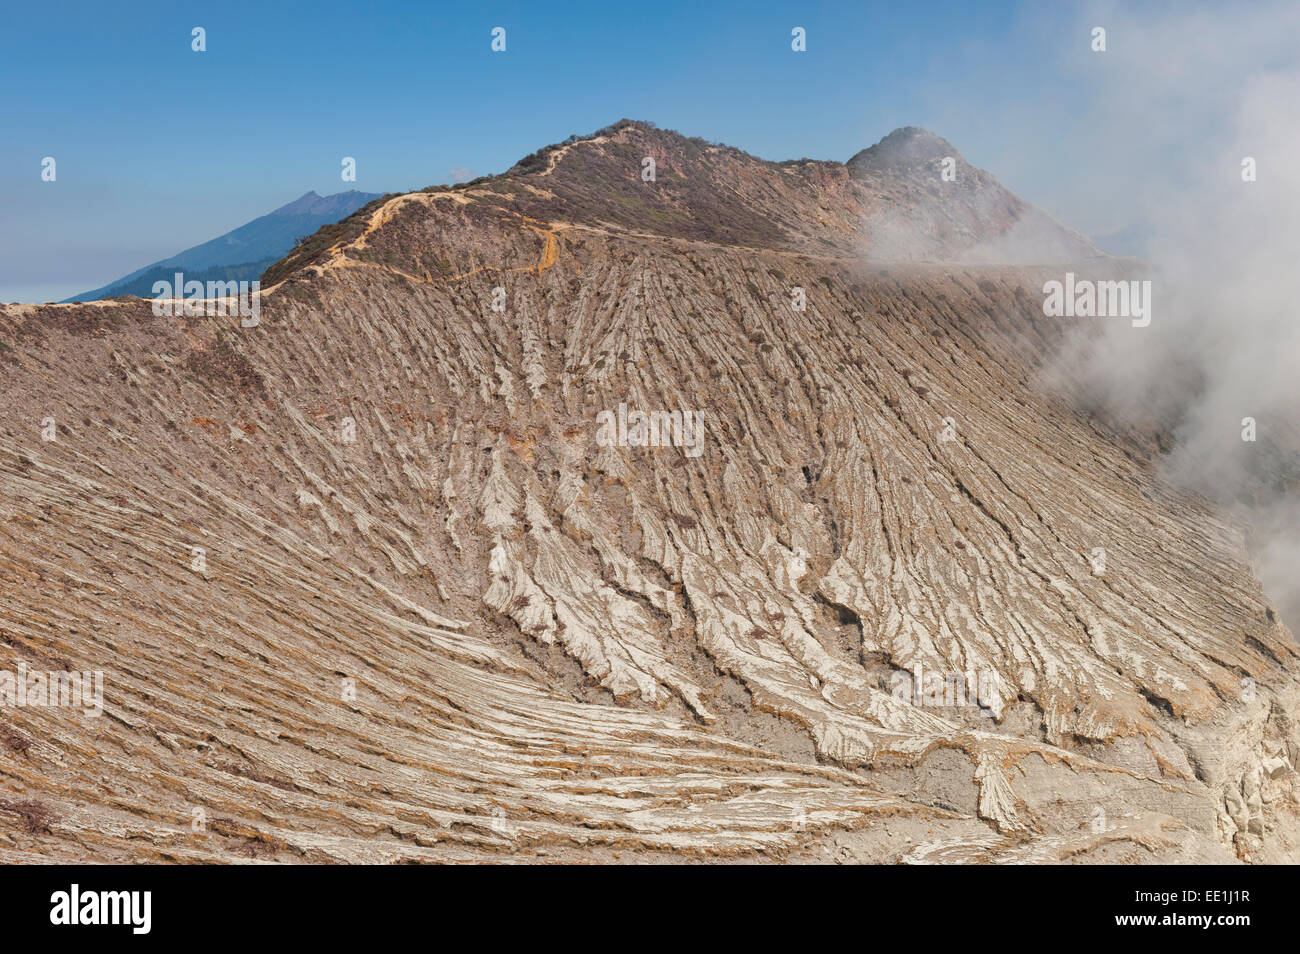 Kawah Ijen volcano slope (Ijen crater), Banyuwangi, East Java, Indonesia, Southeast Asia, Asia - Stock Image